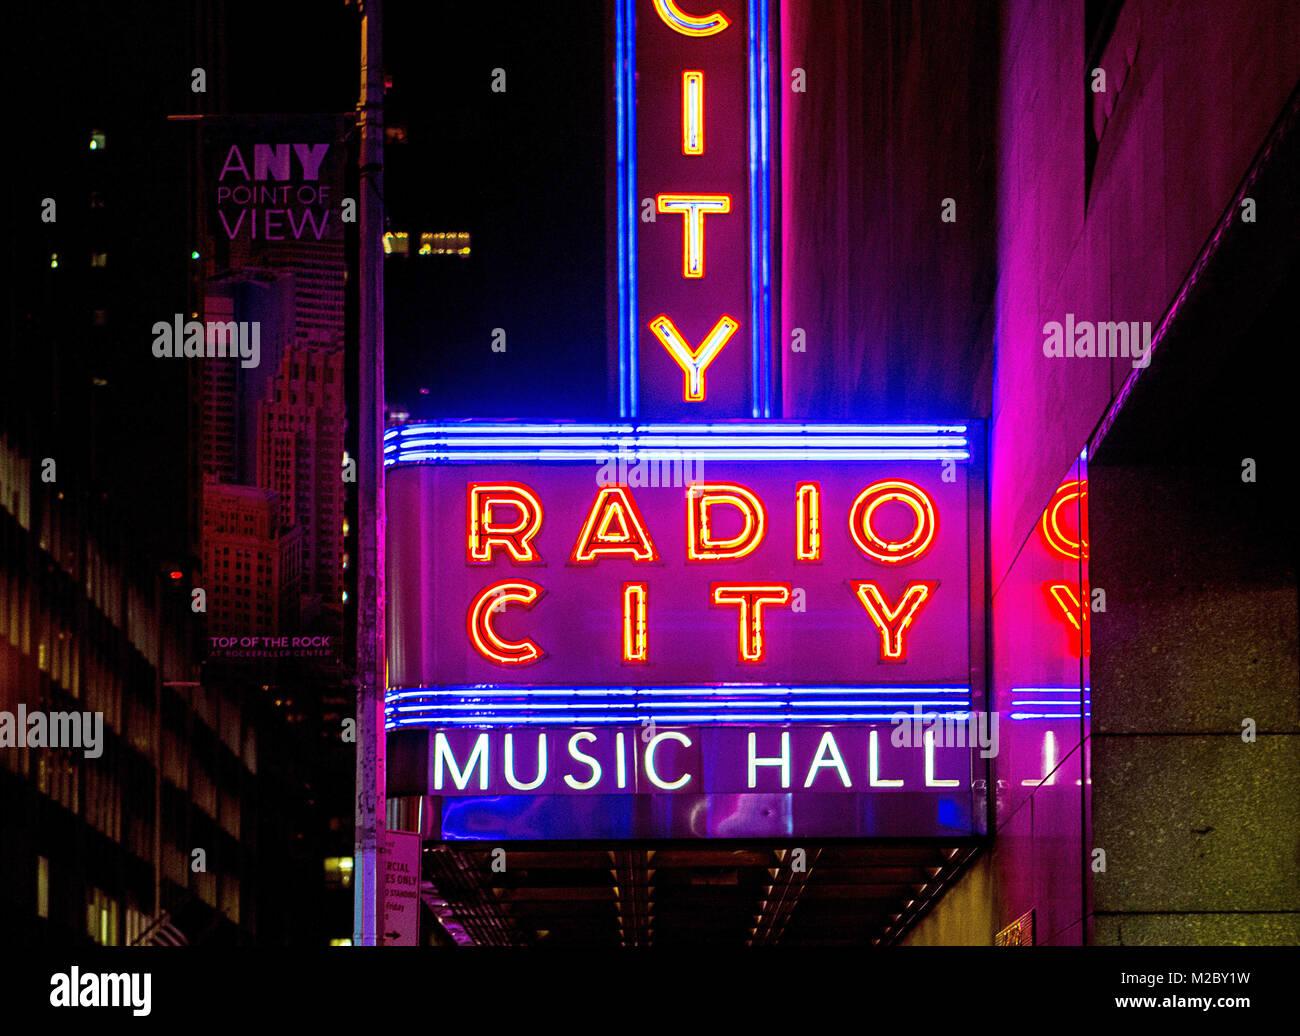 outside neon lights of radio city music hall in new york, usa, - Stock Image